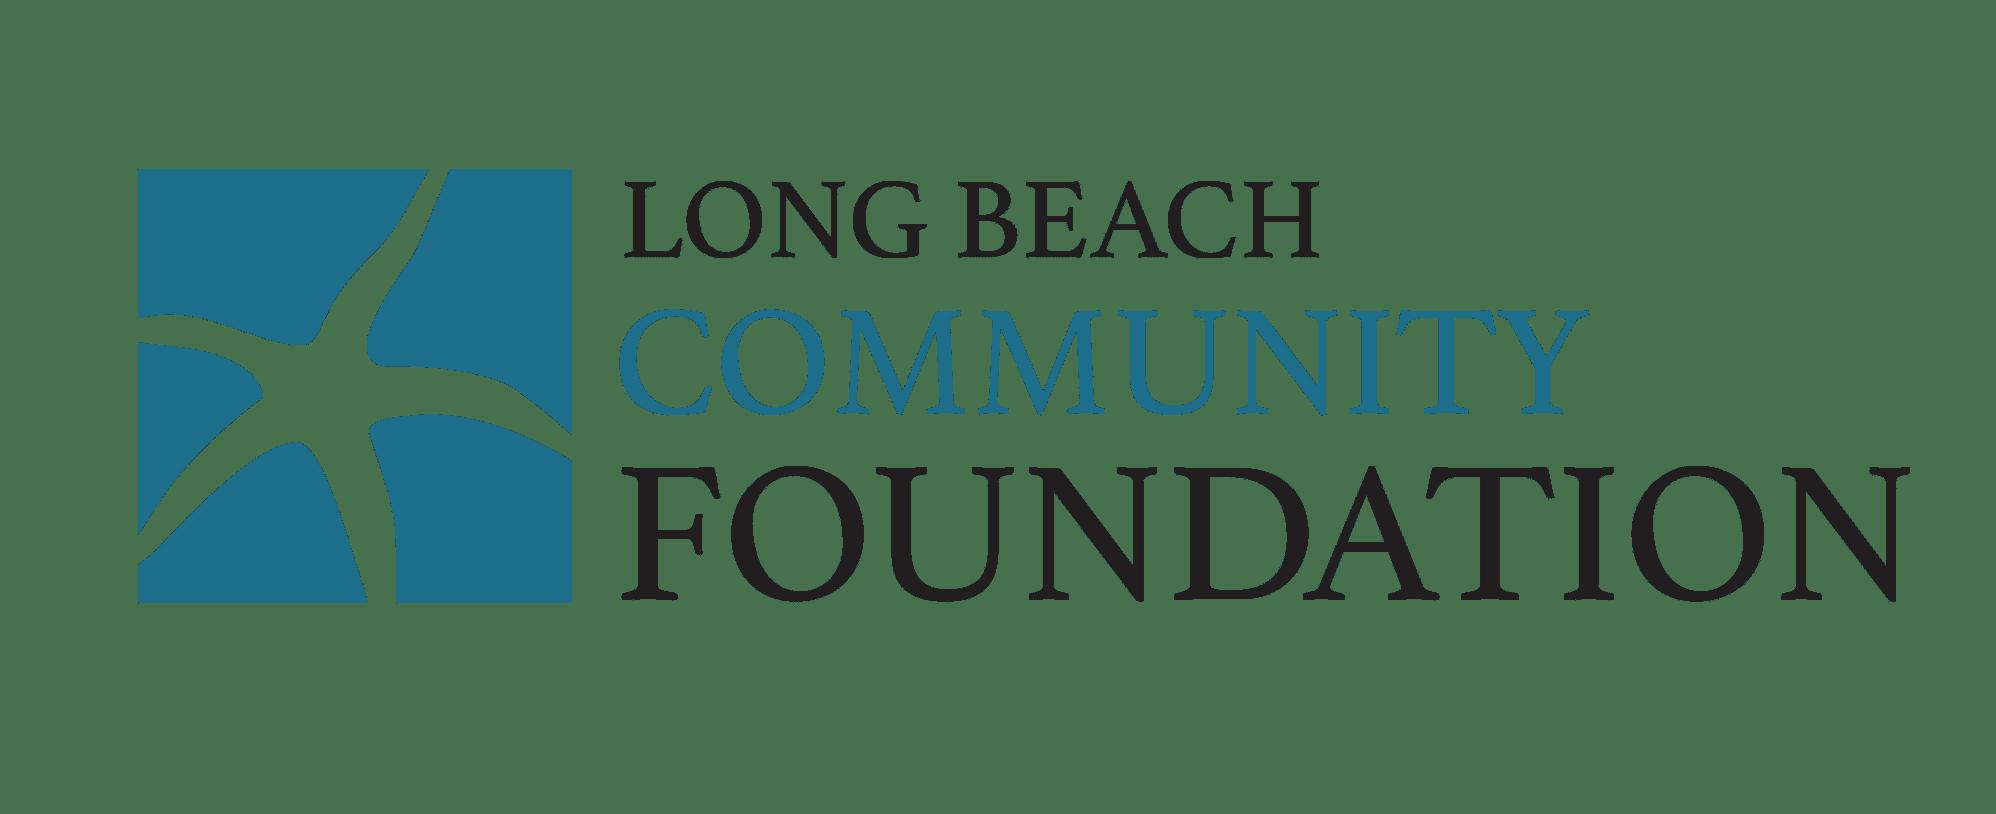 logo of Long Beach Community Foundation